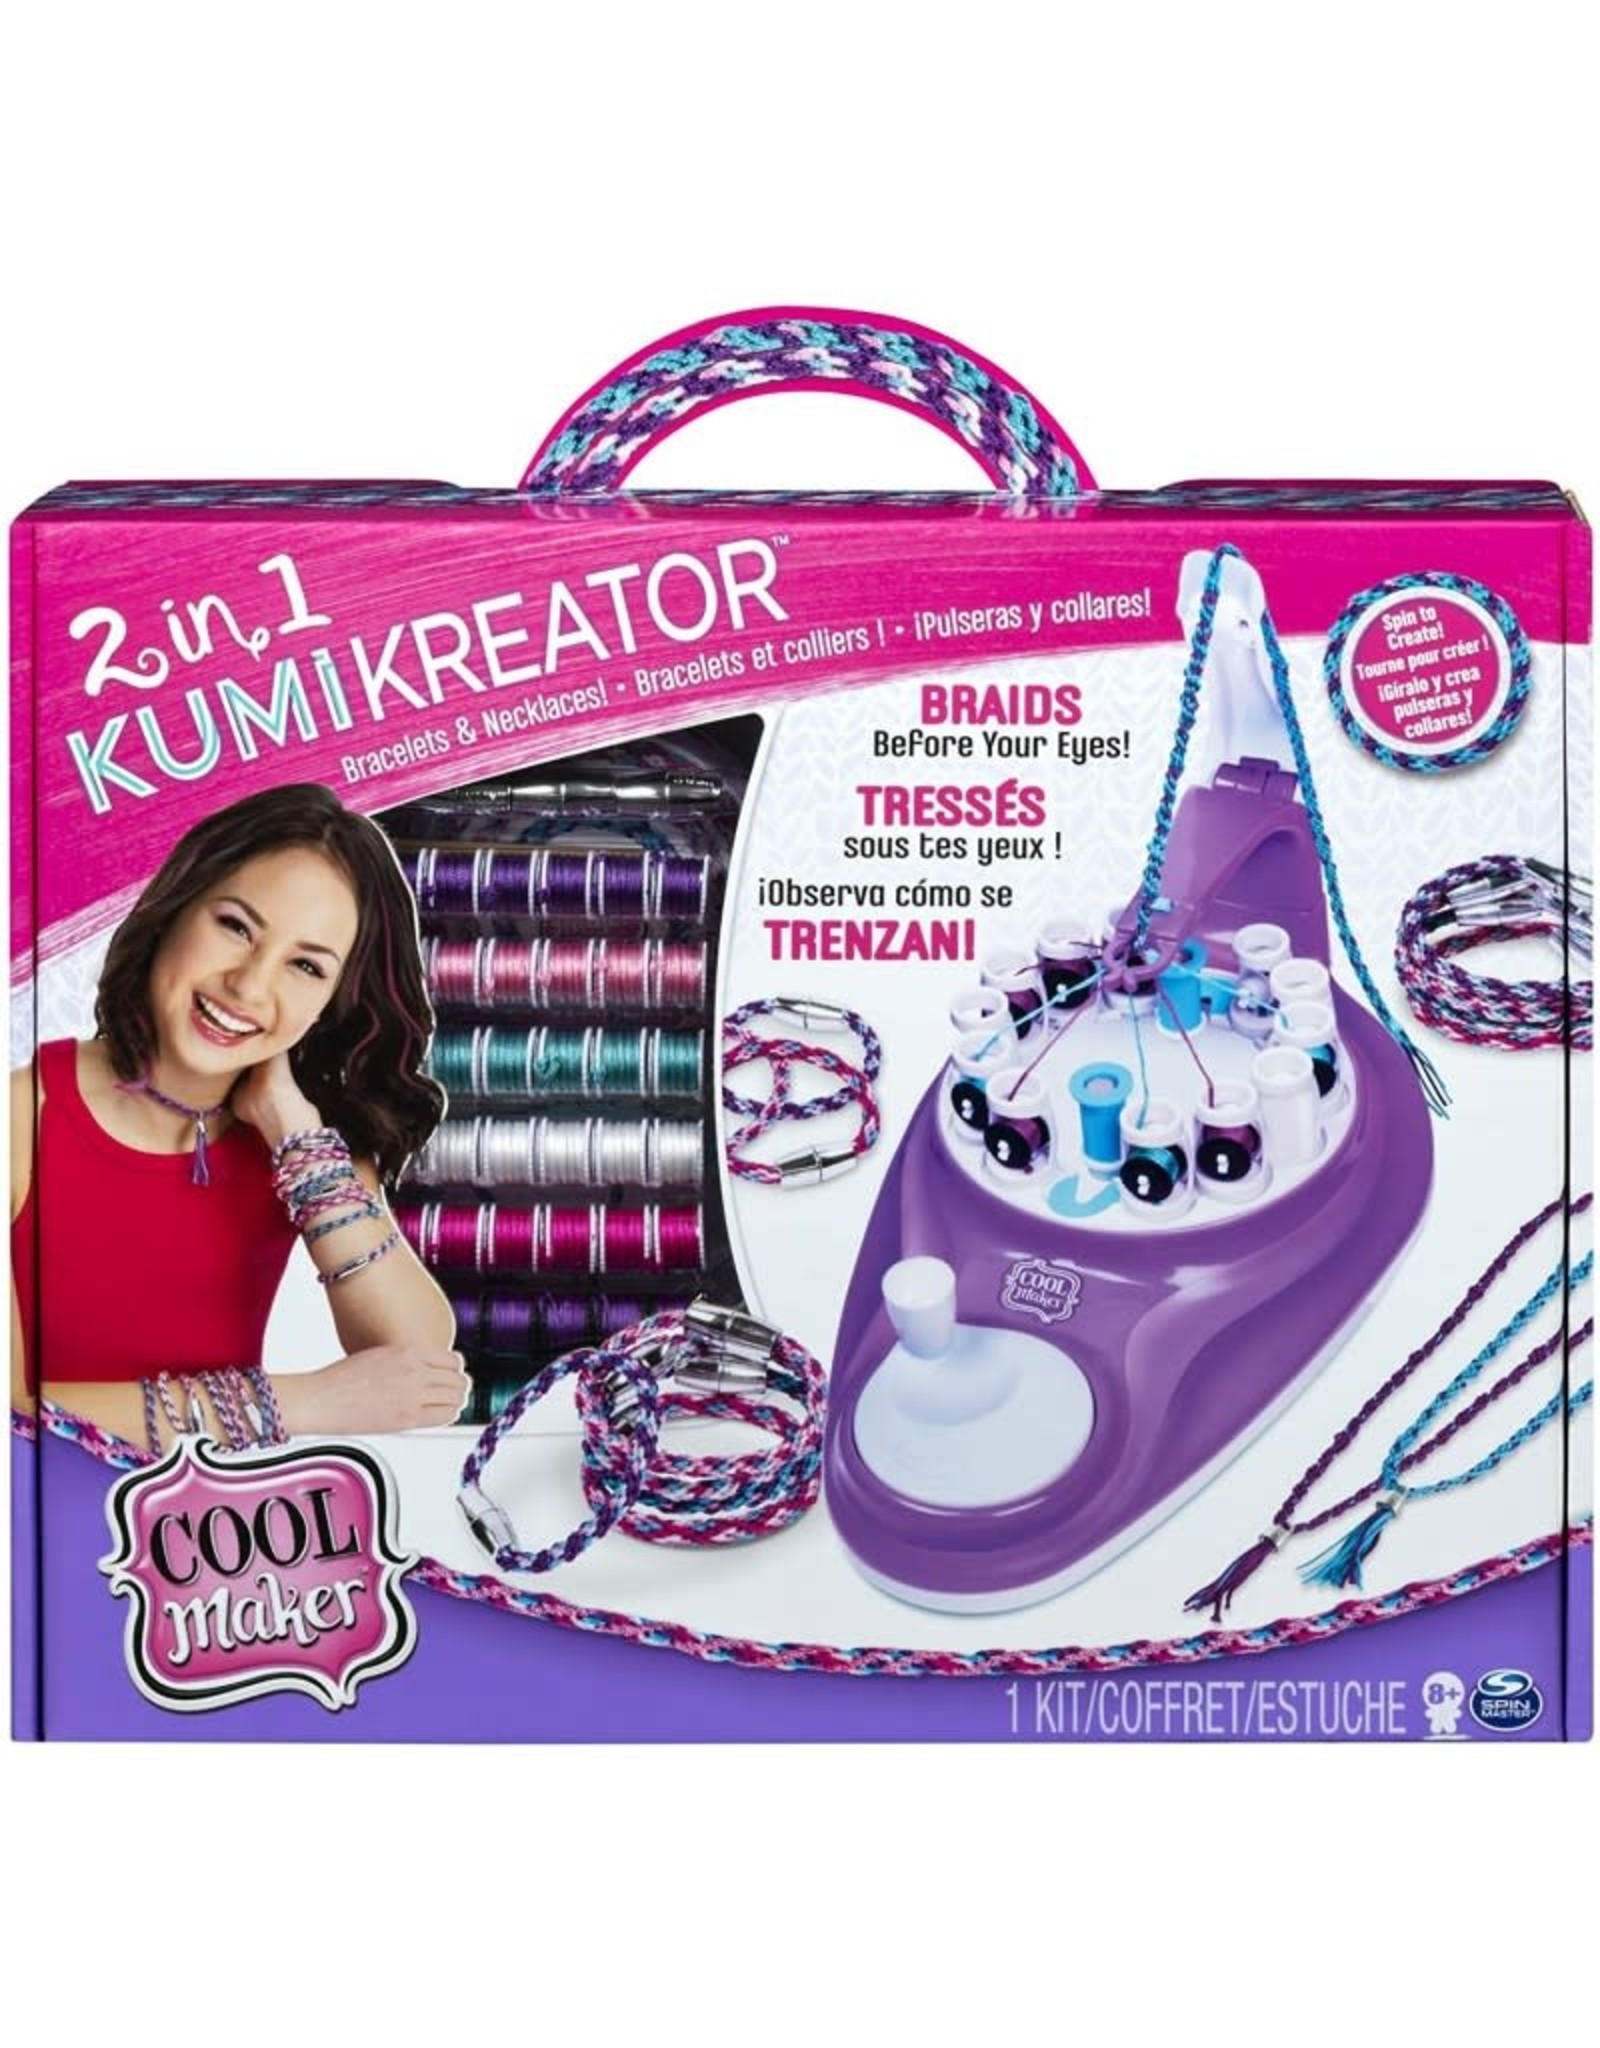 SPIN MASTER Cool Maker Kumi Kreator Studio 2 In 1